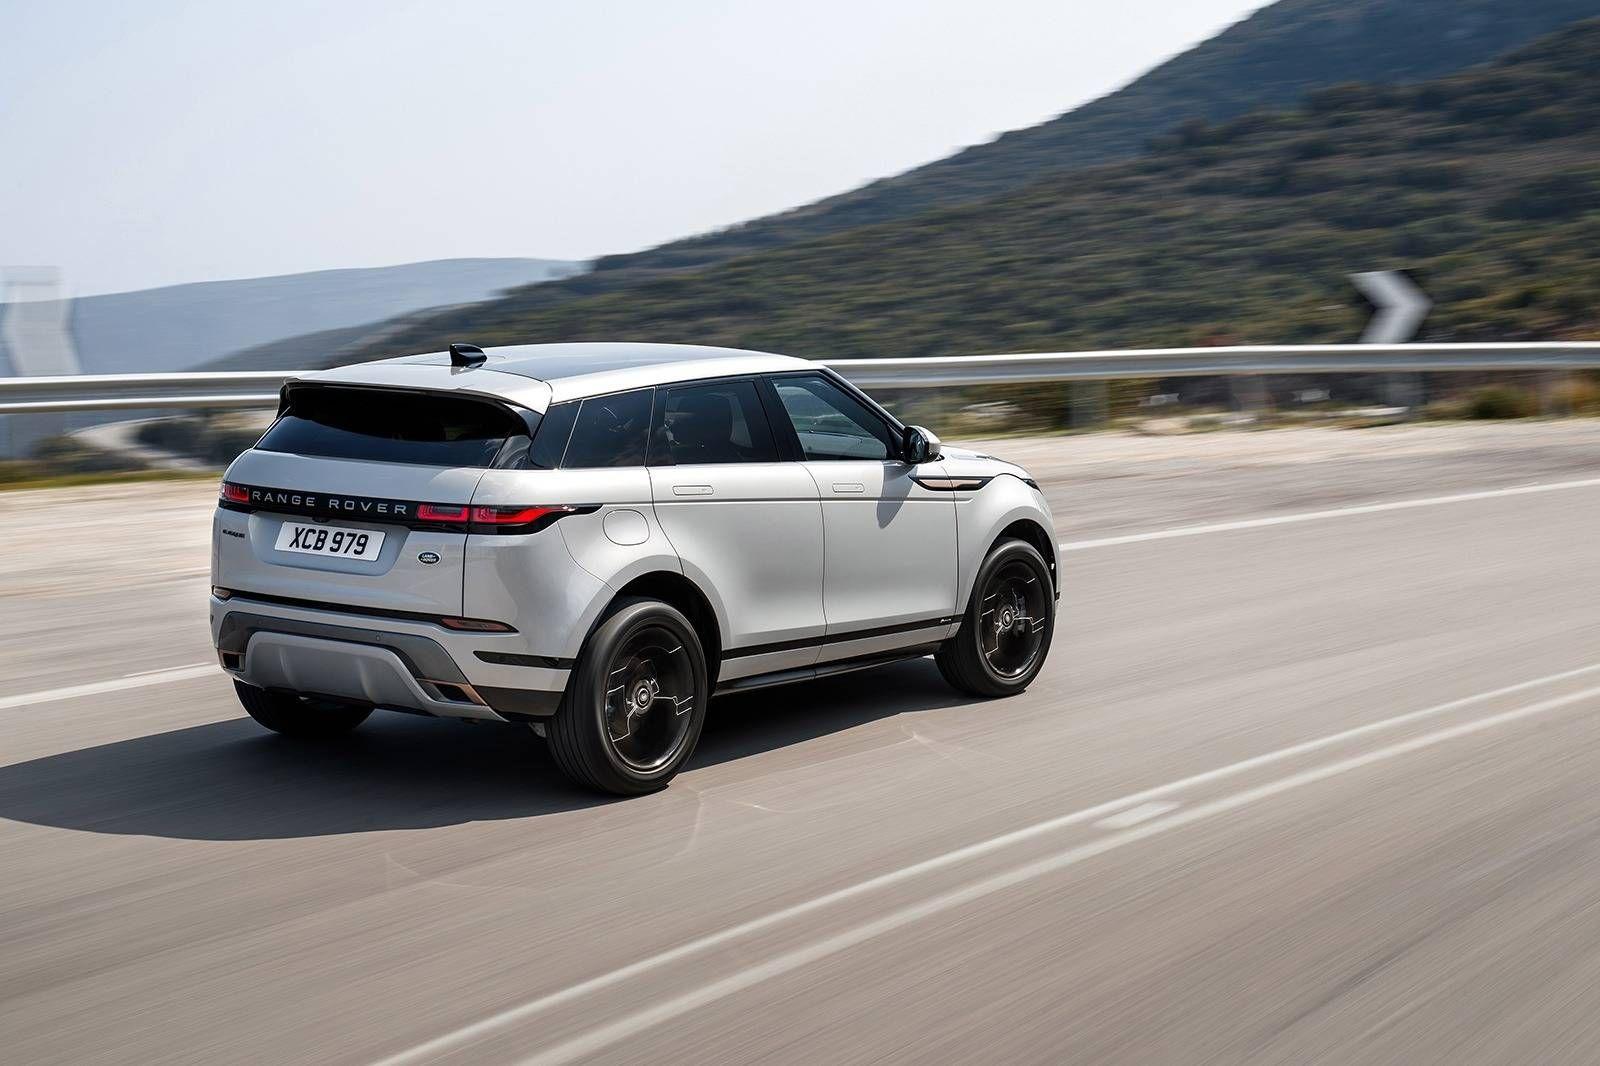 2020 Range Rover Evoque Redesign Detail & Price Info